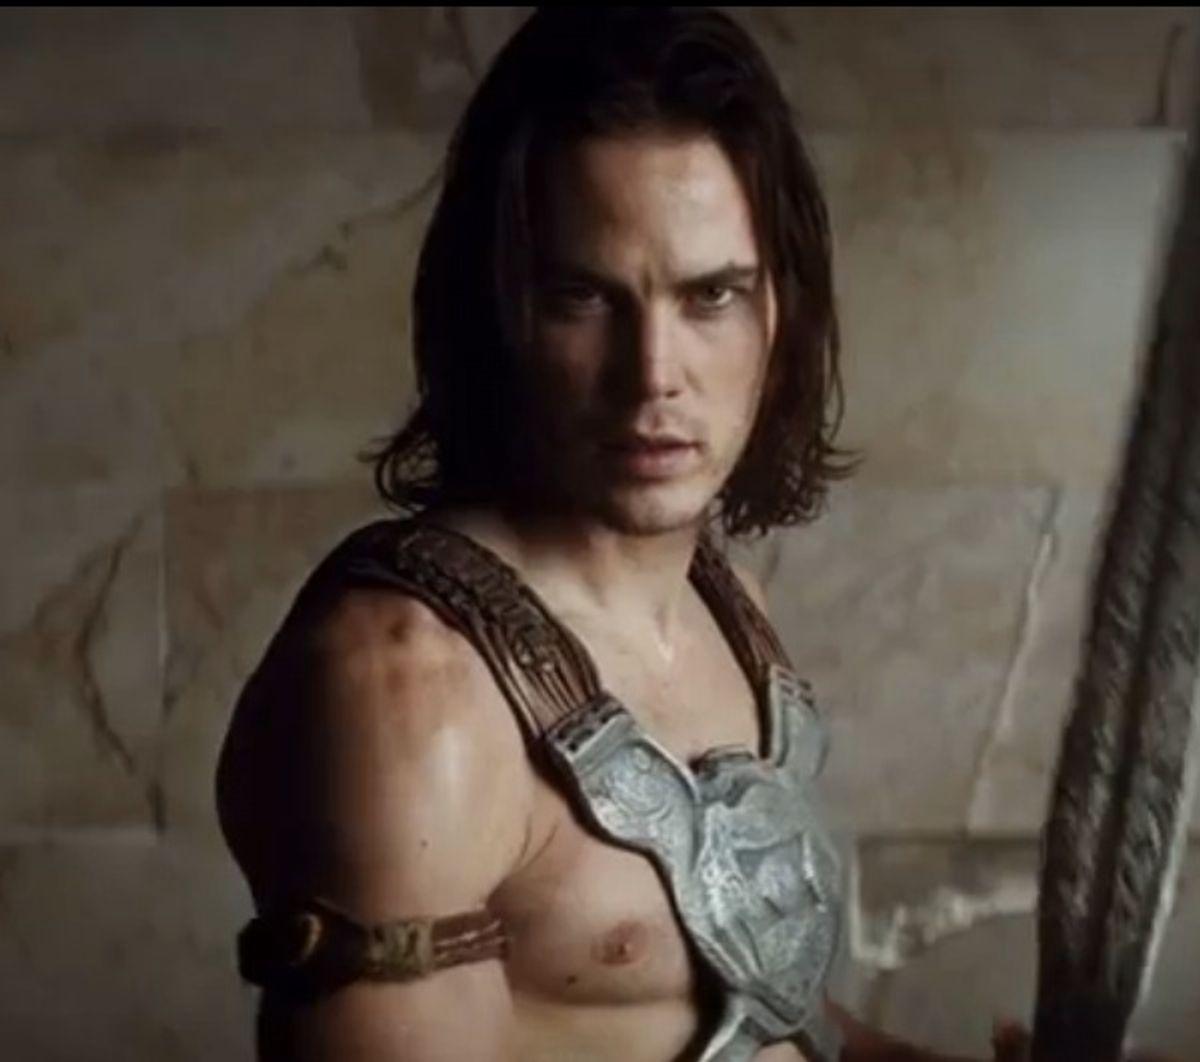 Taylor Kitsch as John Carter of Mars, as shirtless as God intended.